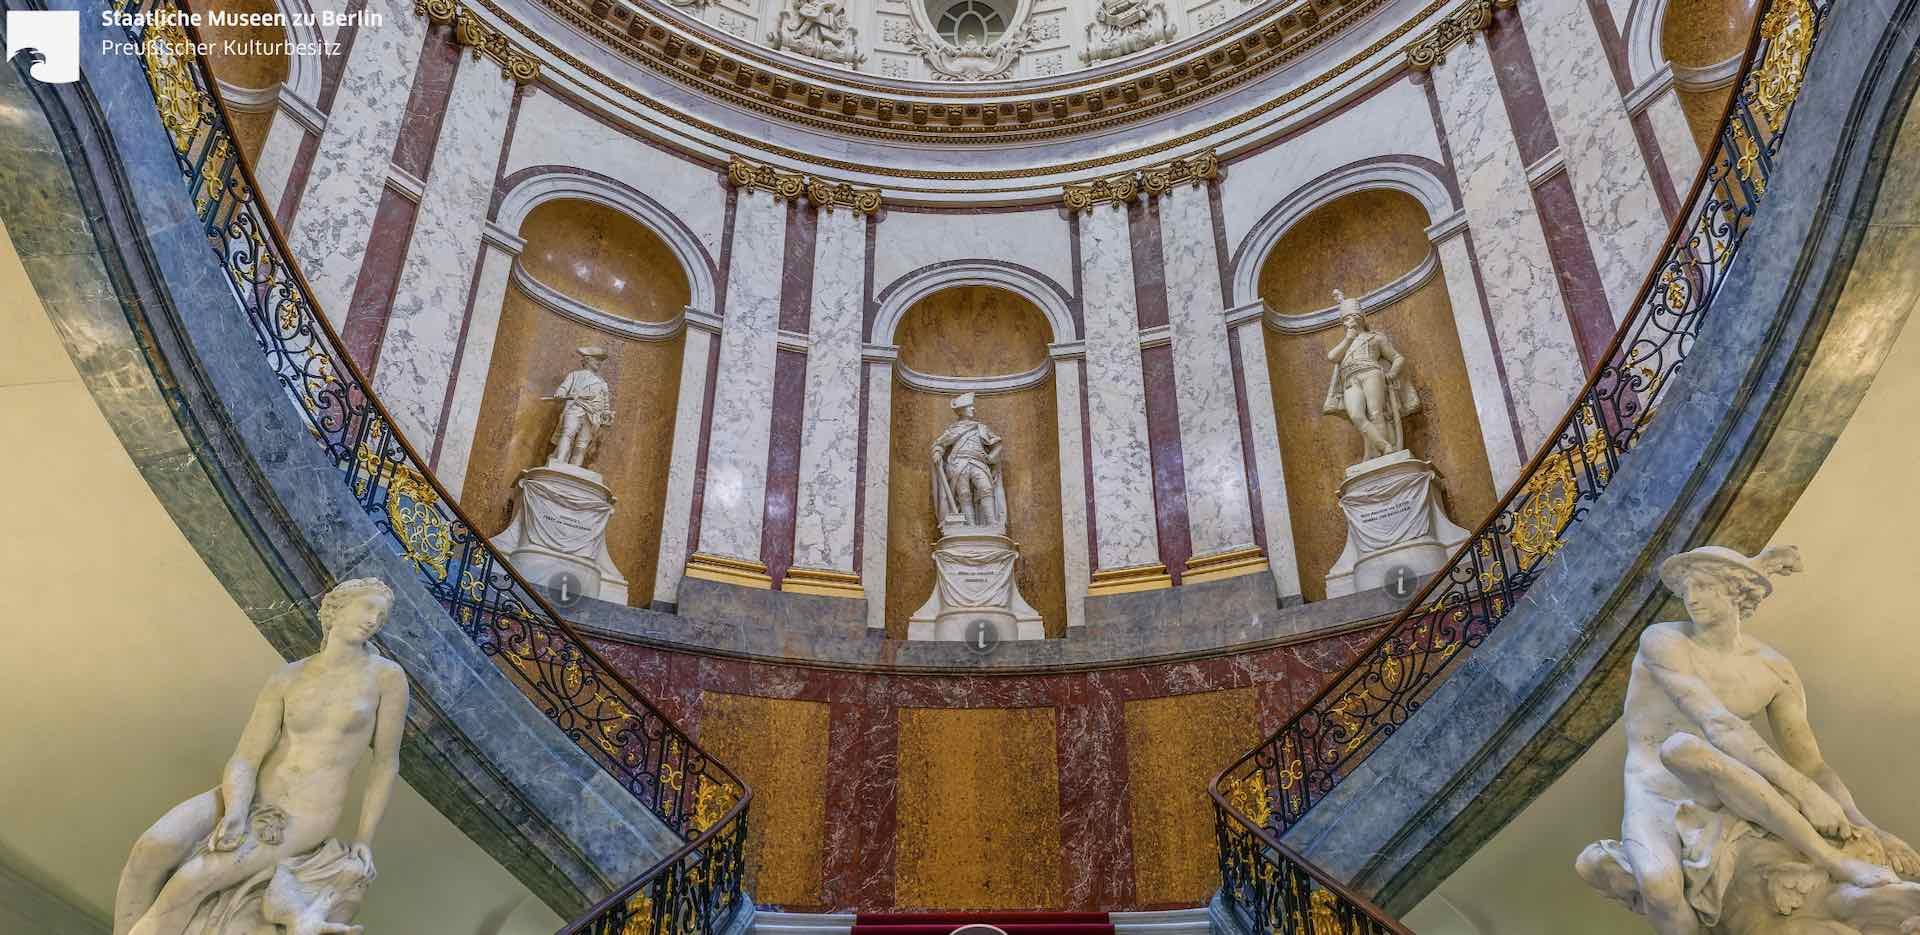 bode museum berlin virtual tour